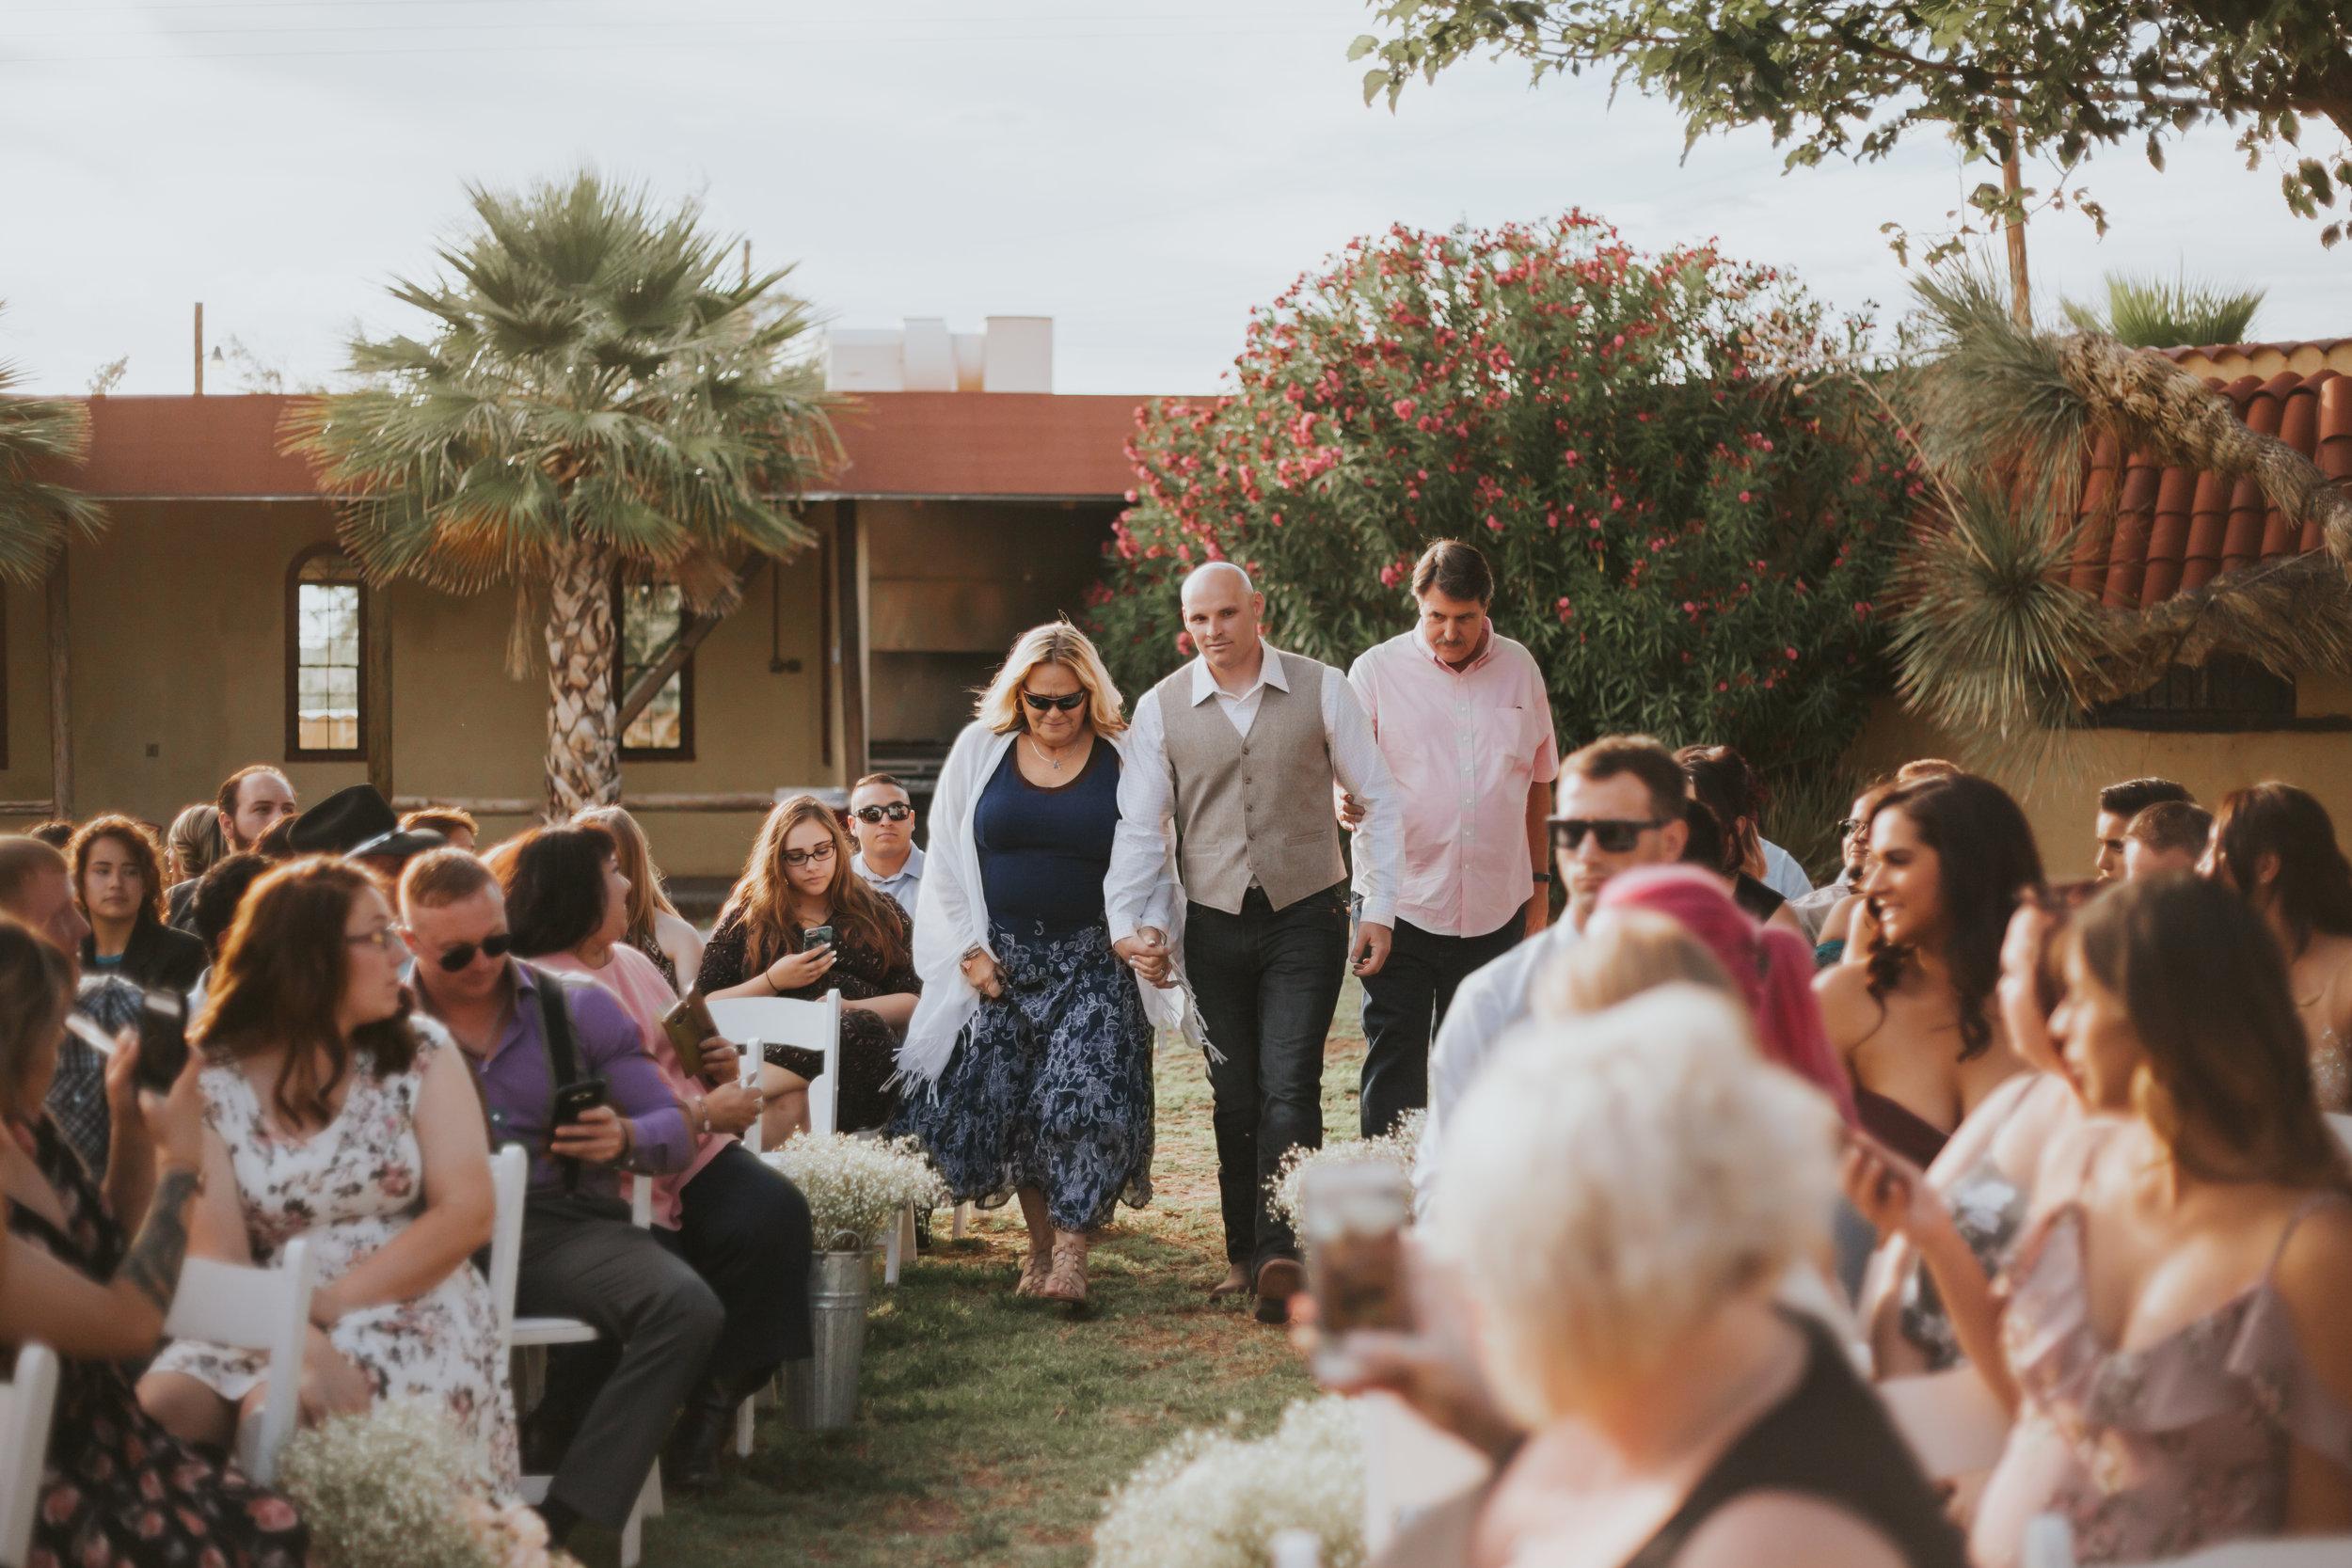 william-taylor-fabens-texas-wedding-24